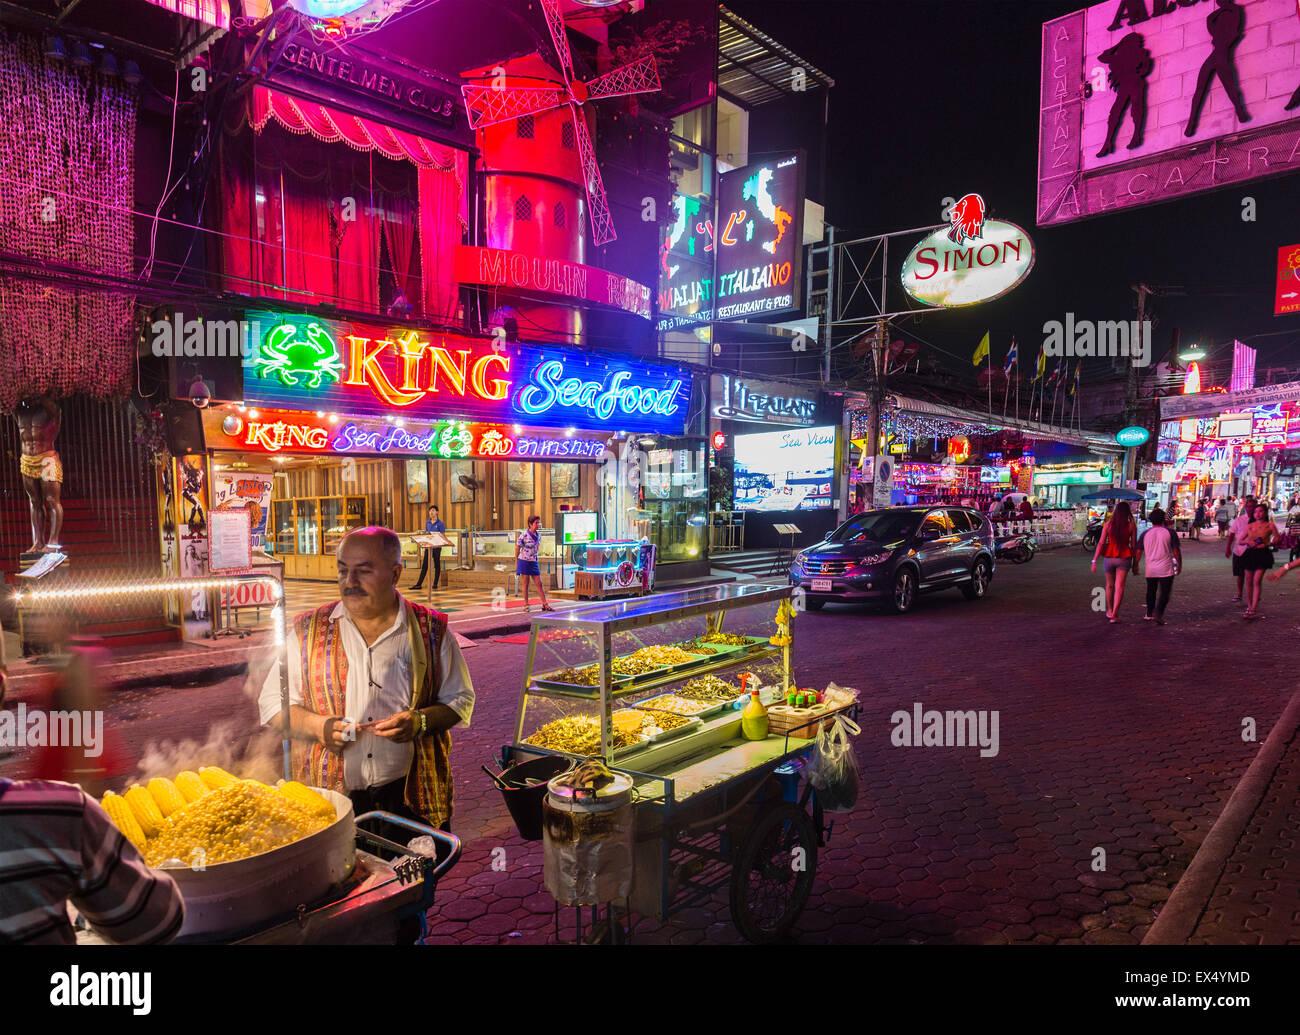 Walking Street, vendor, nightlife, bars, neon signs, Pattaya, Chon Buri Province, Thailand - Stock Image